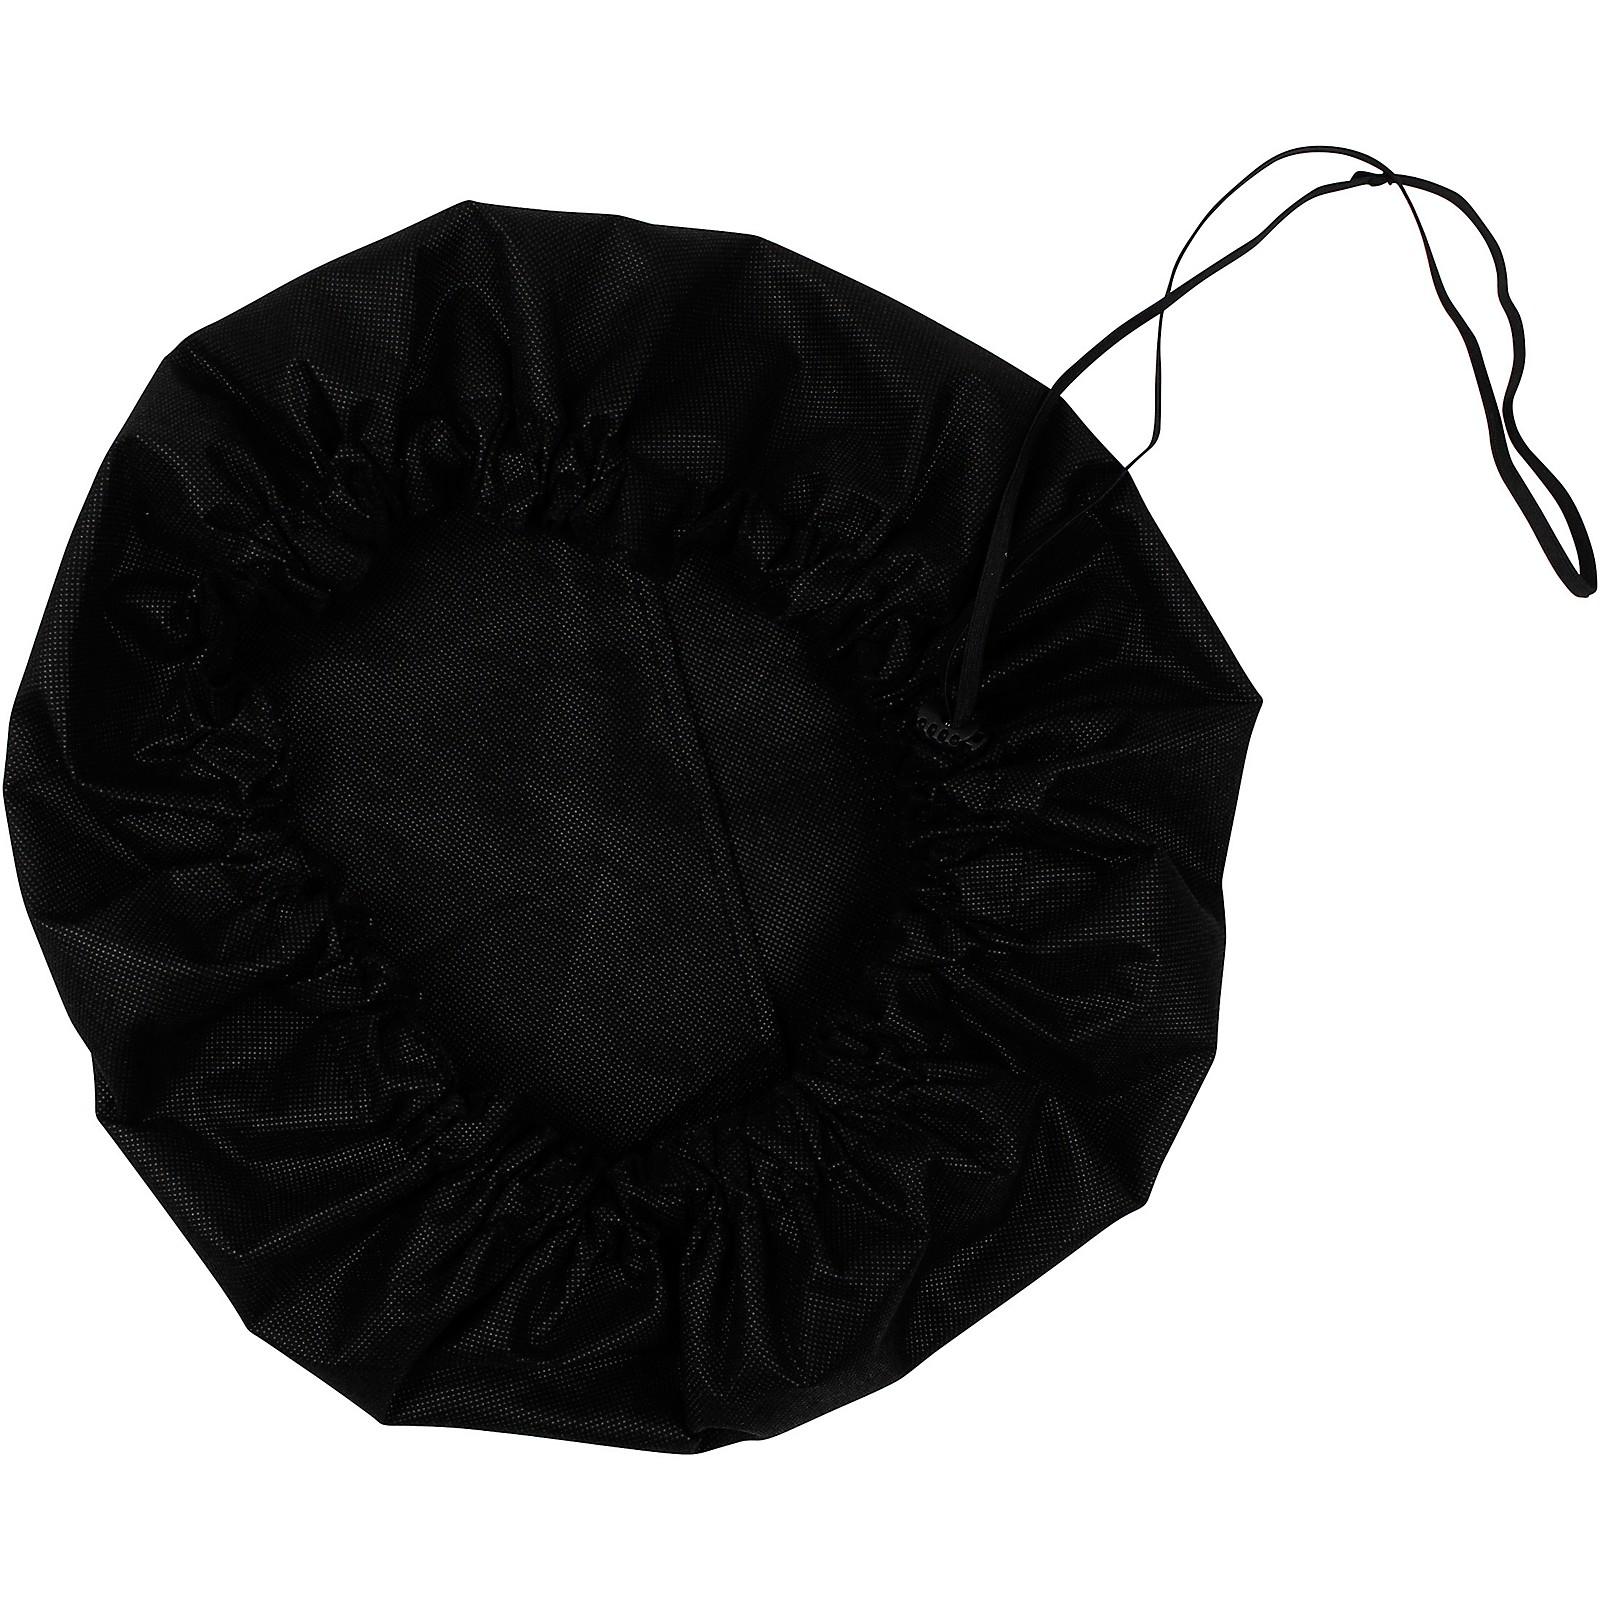 Gator Black Bell Mask With MERV-13 Filter, 22-23